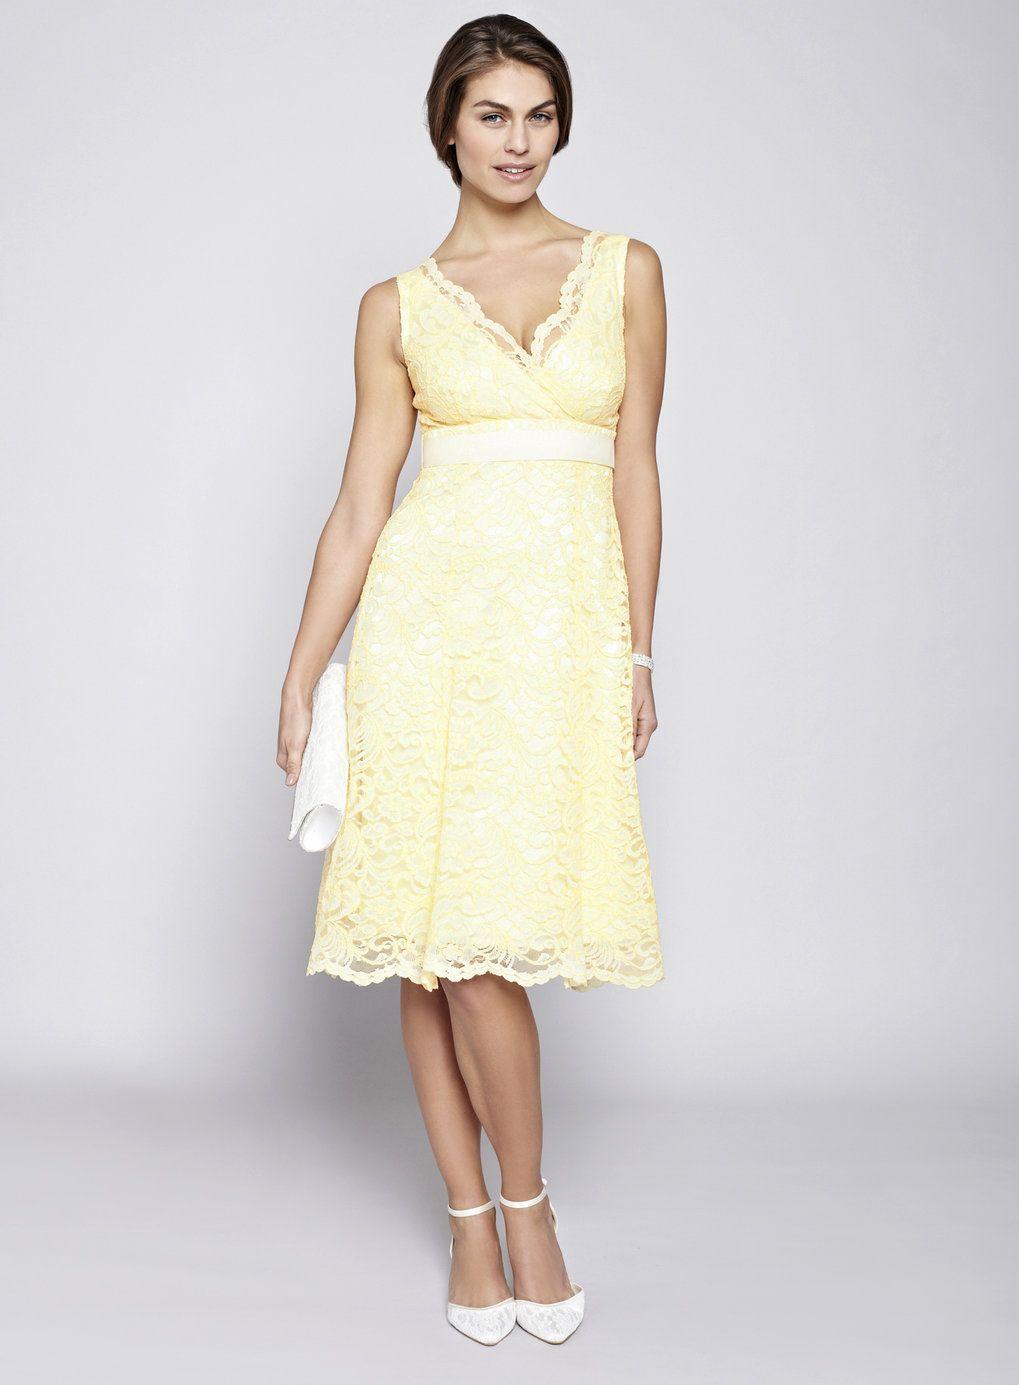 Yellow bella lace short bridesmaid dress wedding pinterest wedding